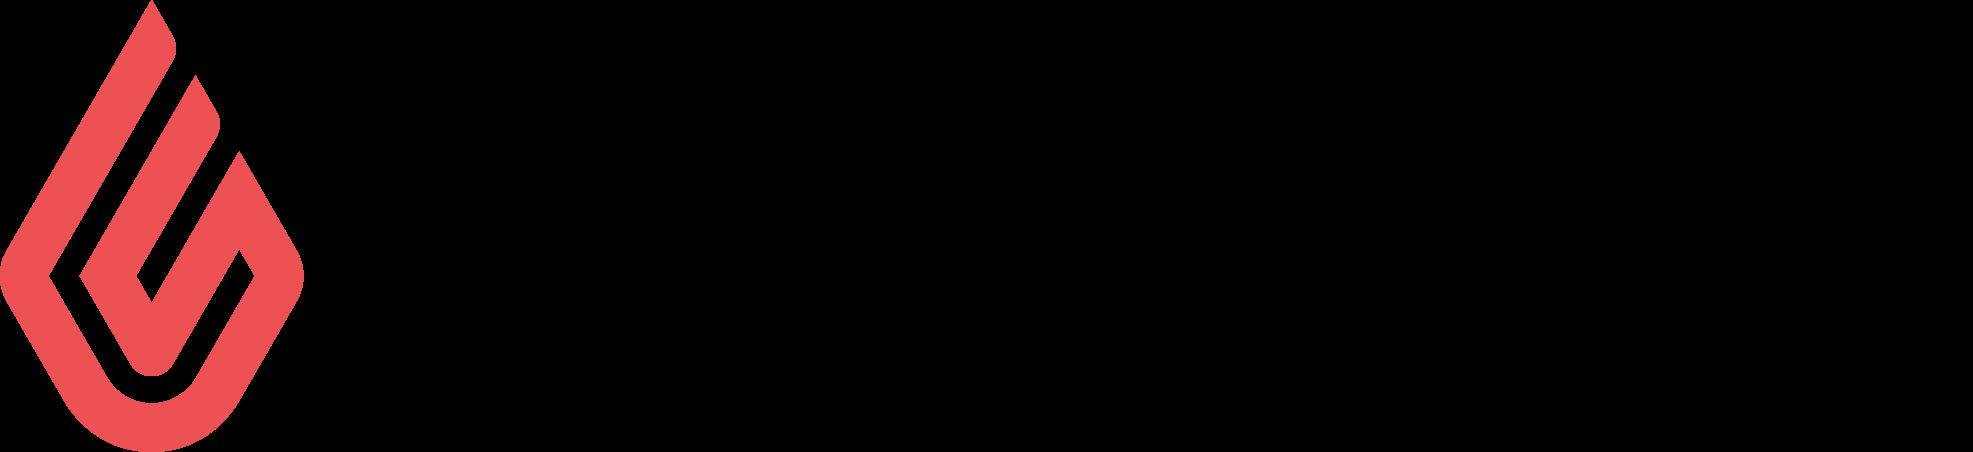 Lightspeed retail pos system logo